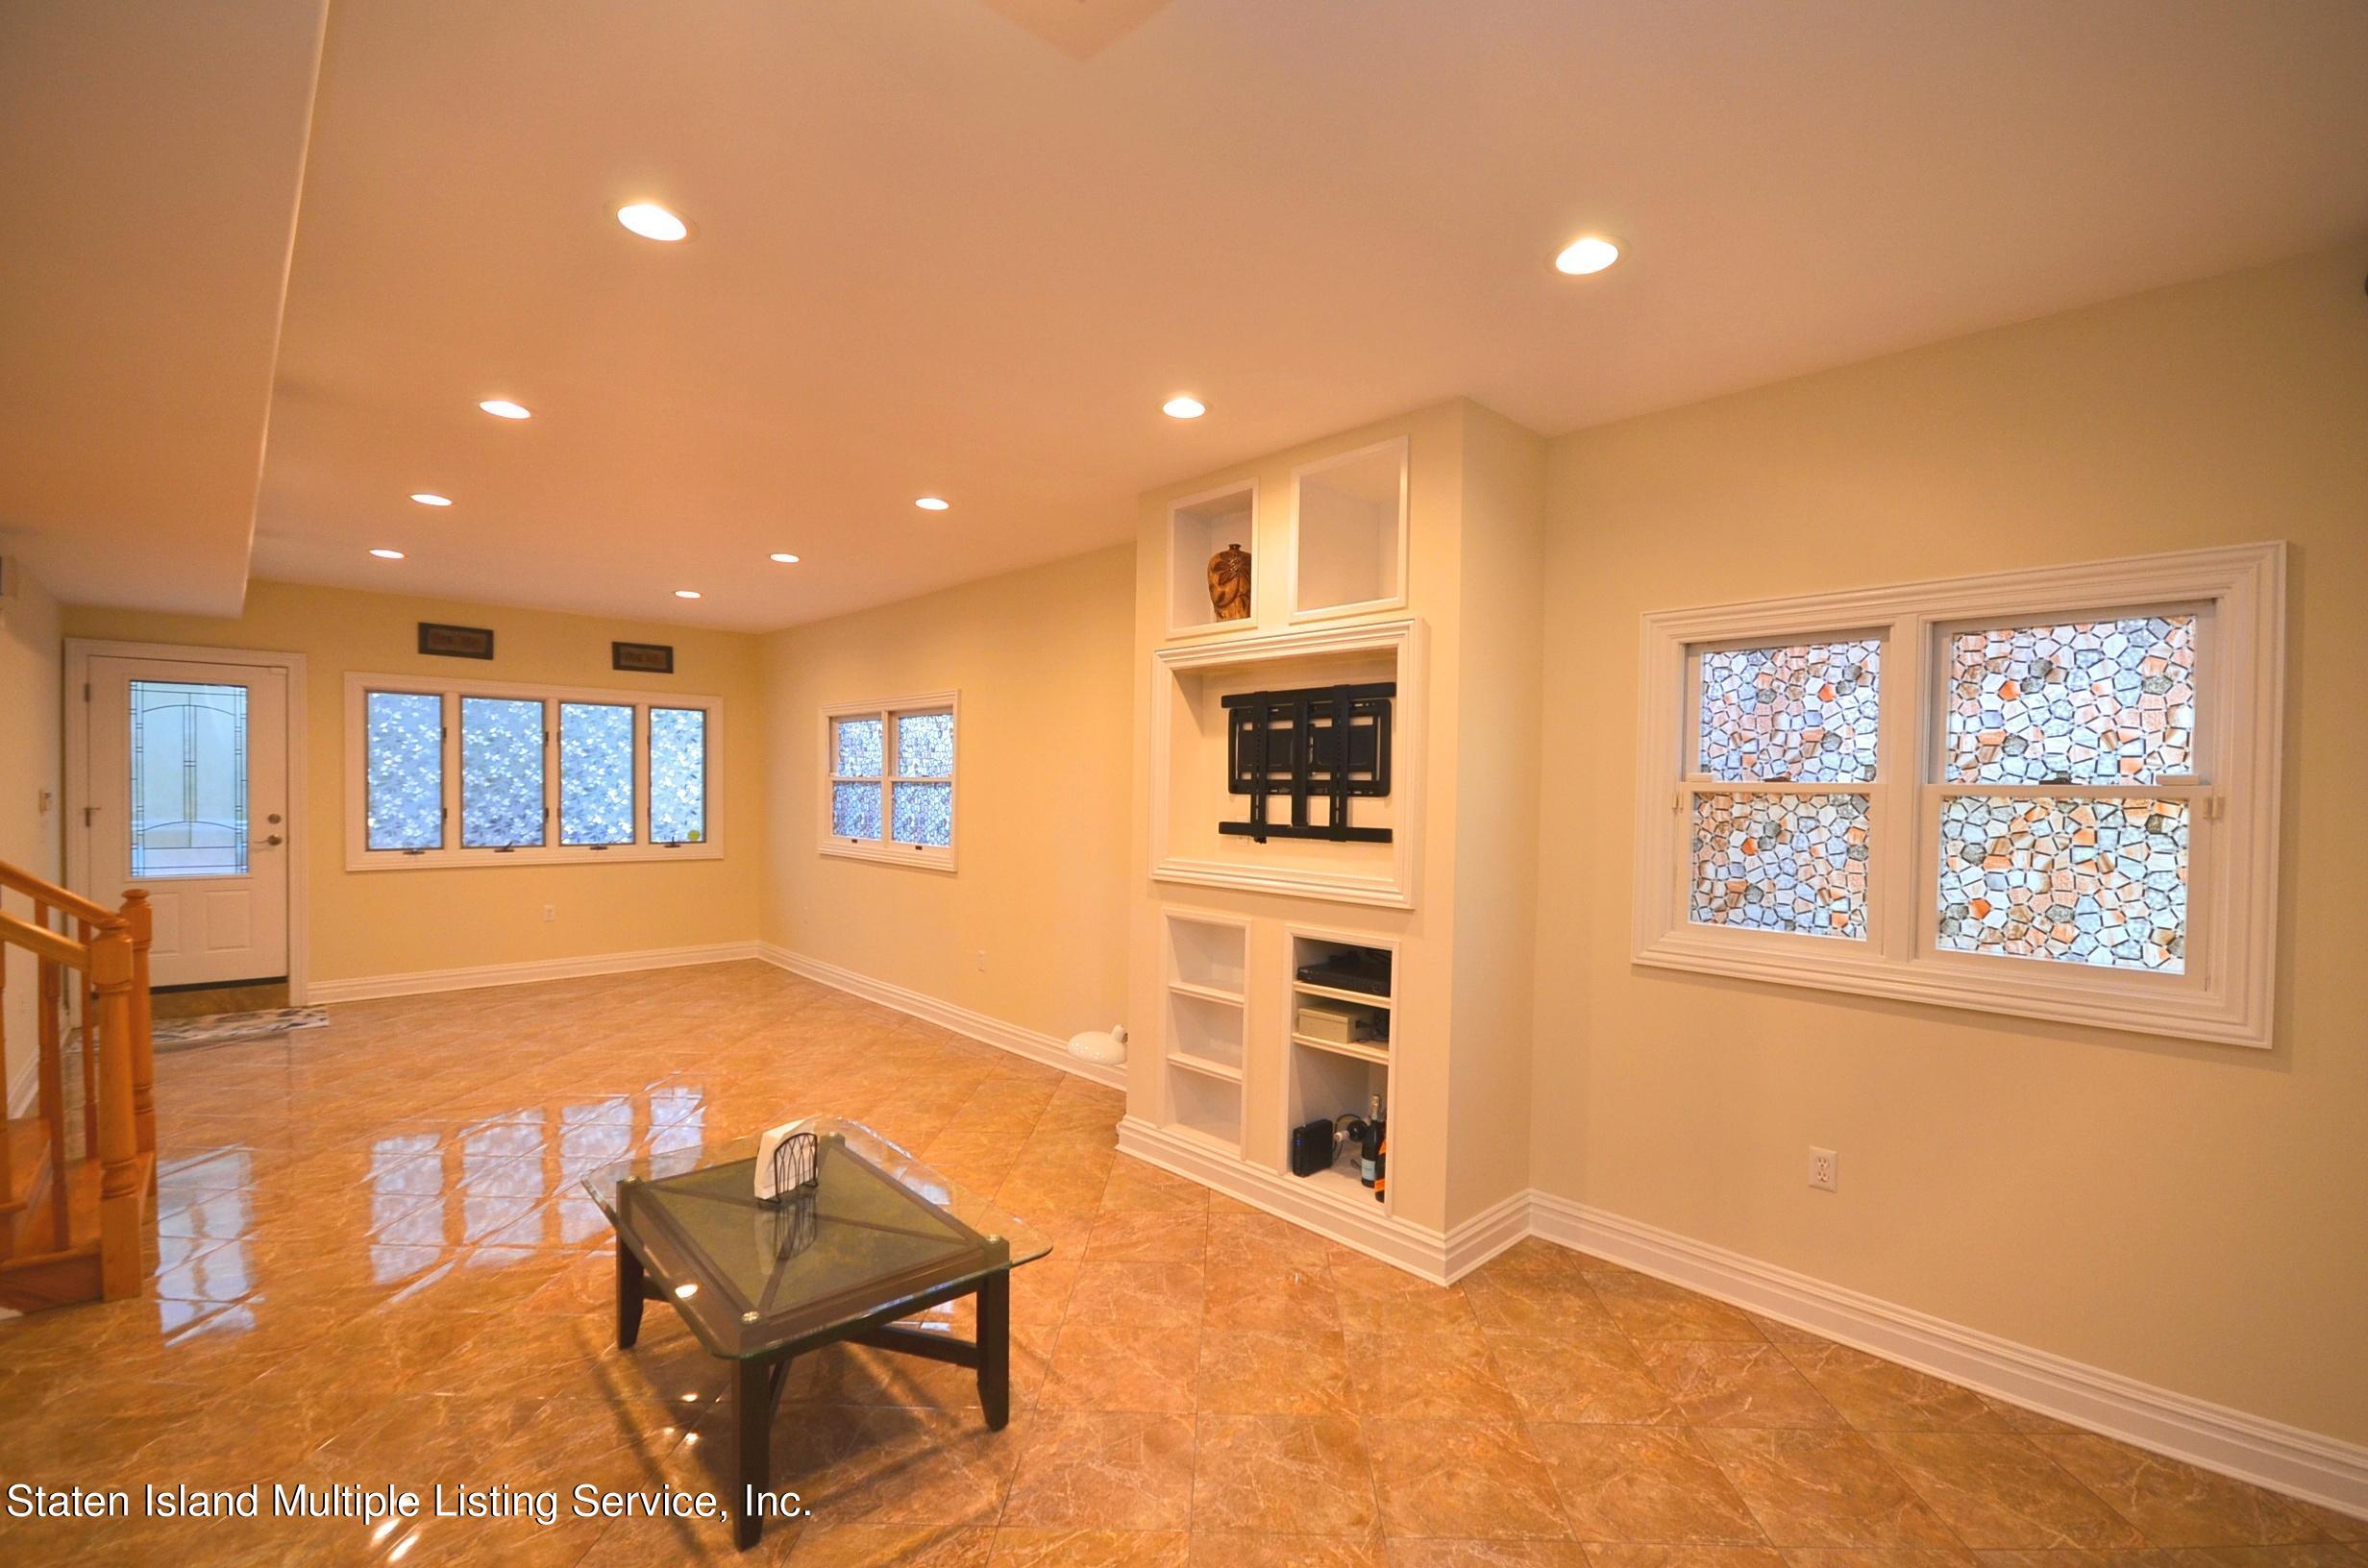 Single Family - Detached 48 Ocean Terrace  Staten Island, NY 10314, MLS-1142240-26